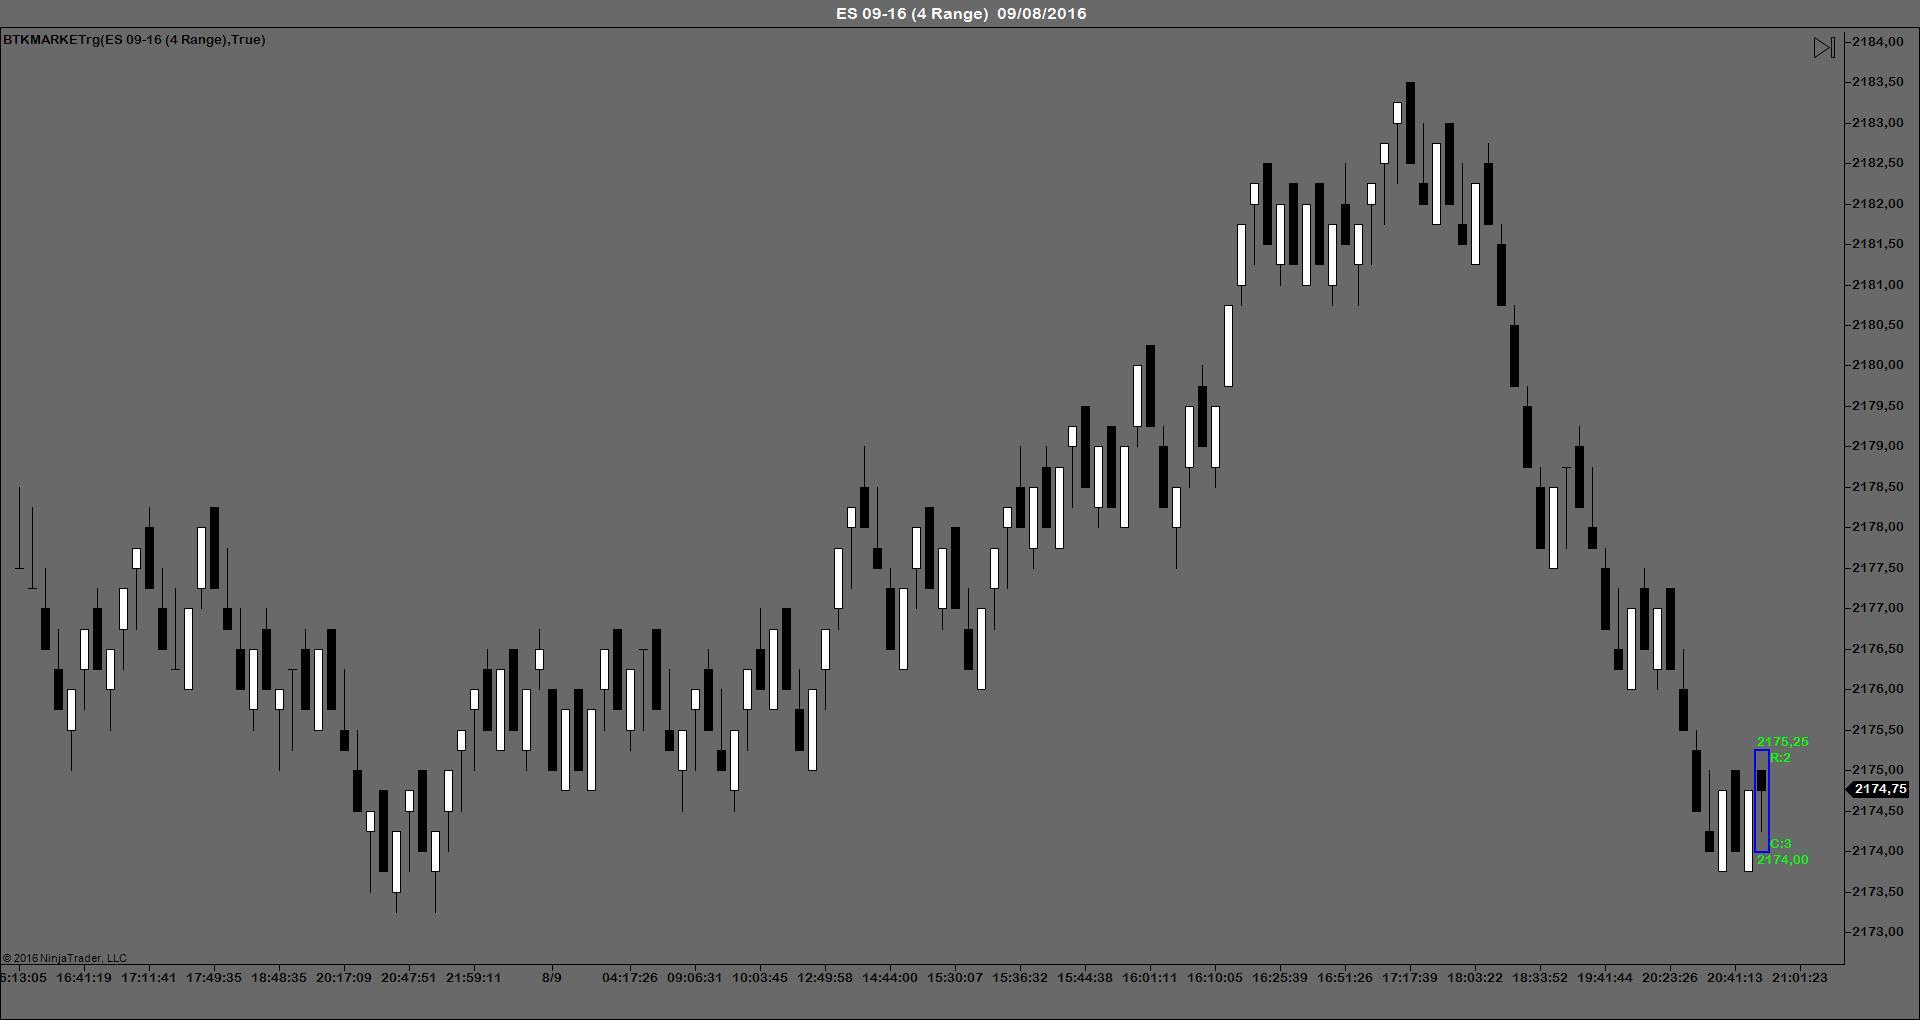 BTKMARKETrg indicador trading